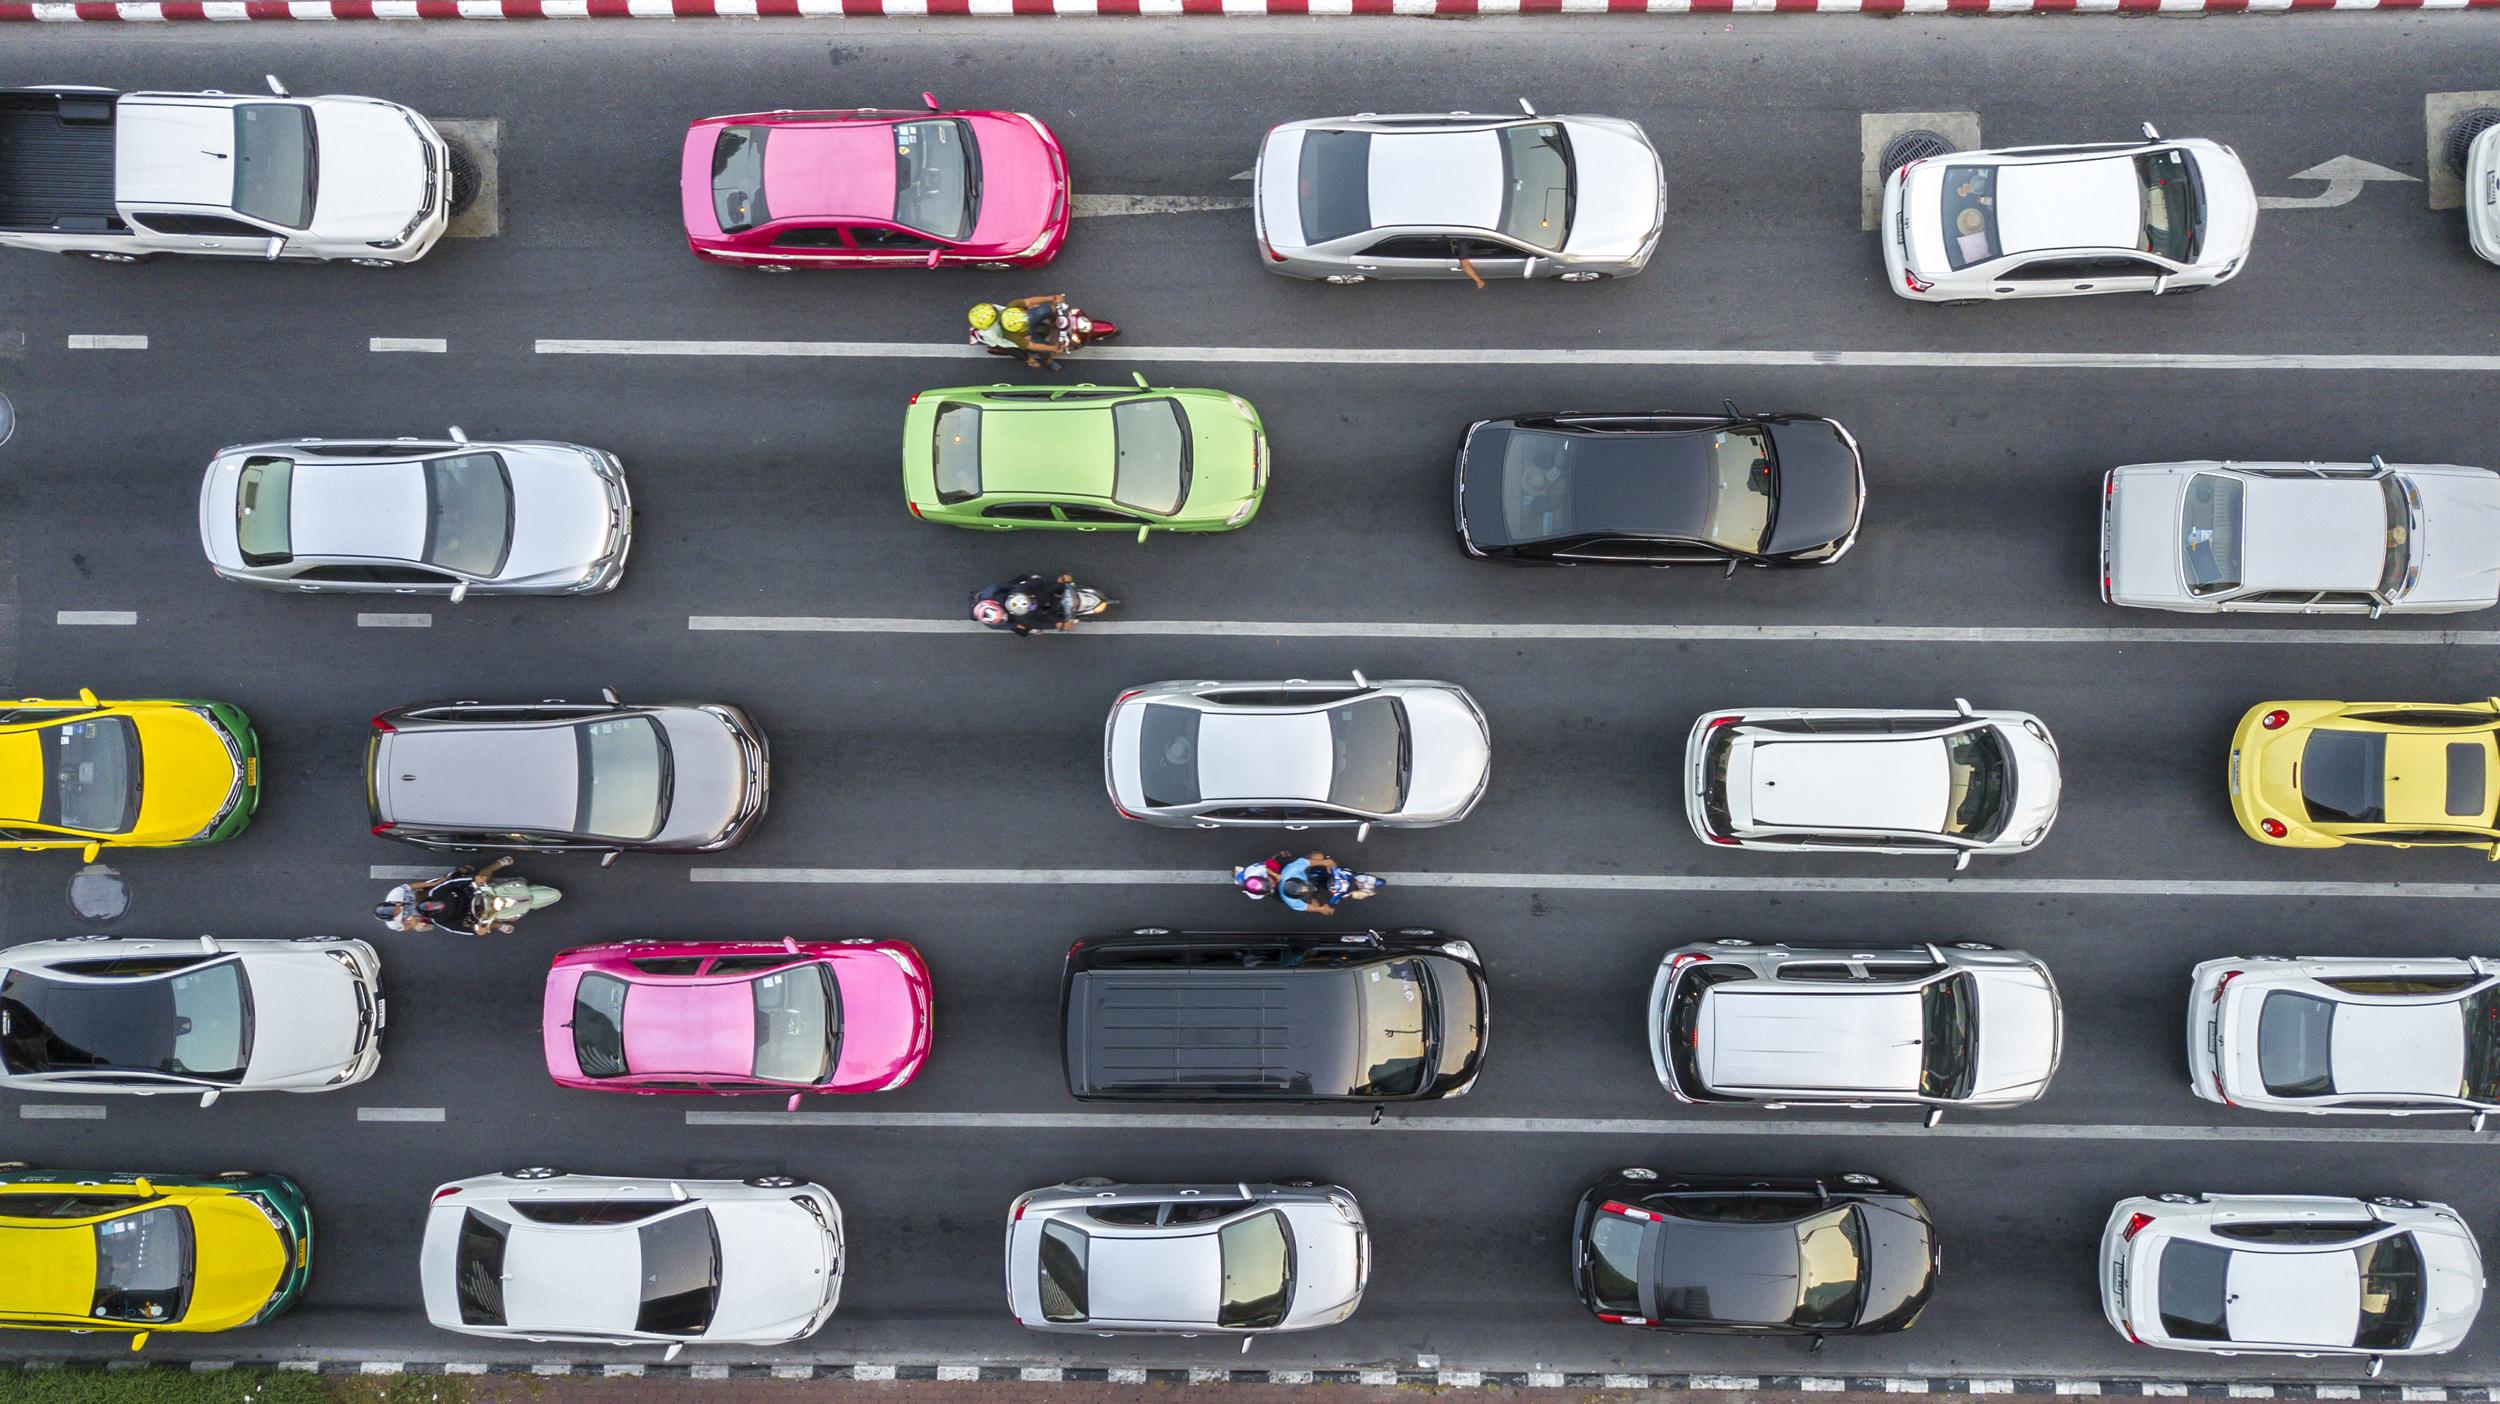 traffic jam, cars, traffic congestion